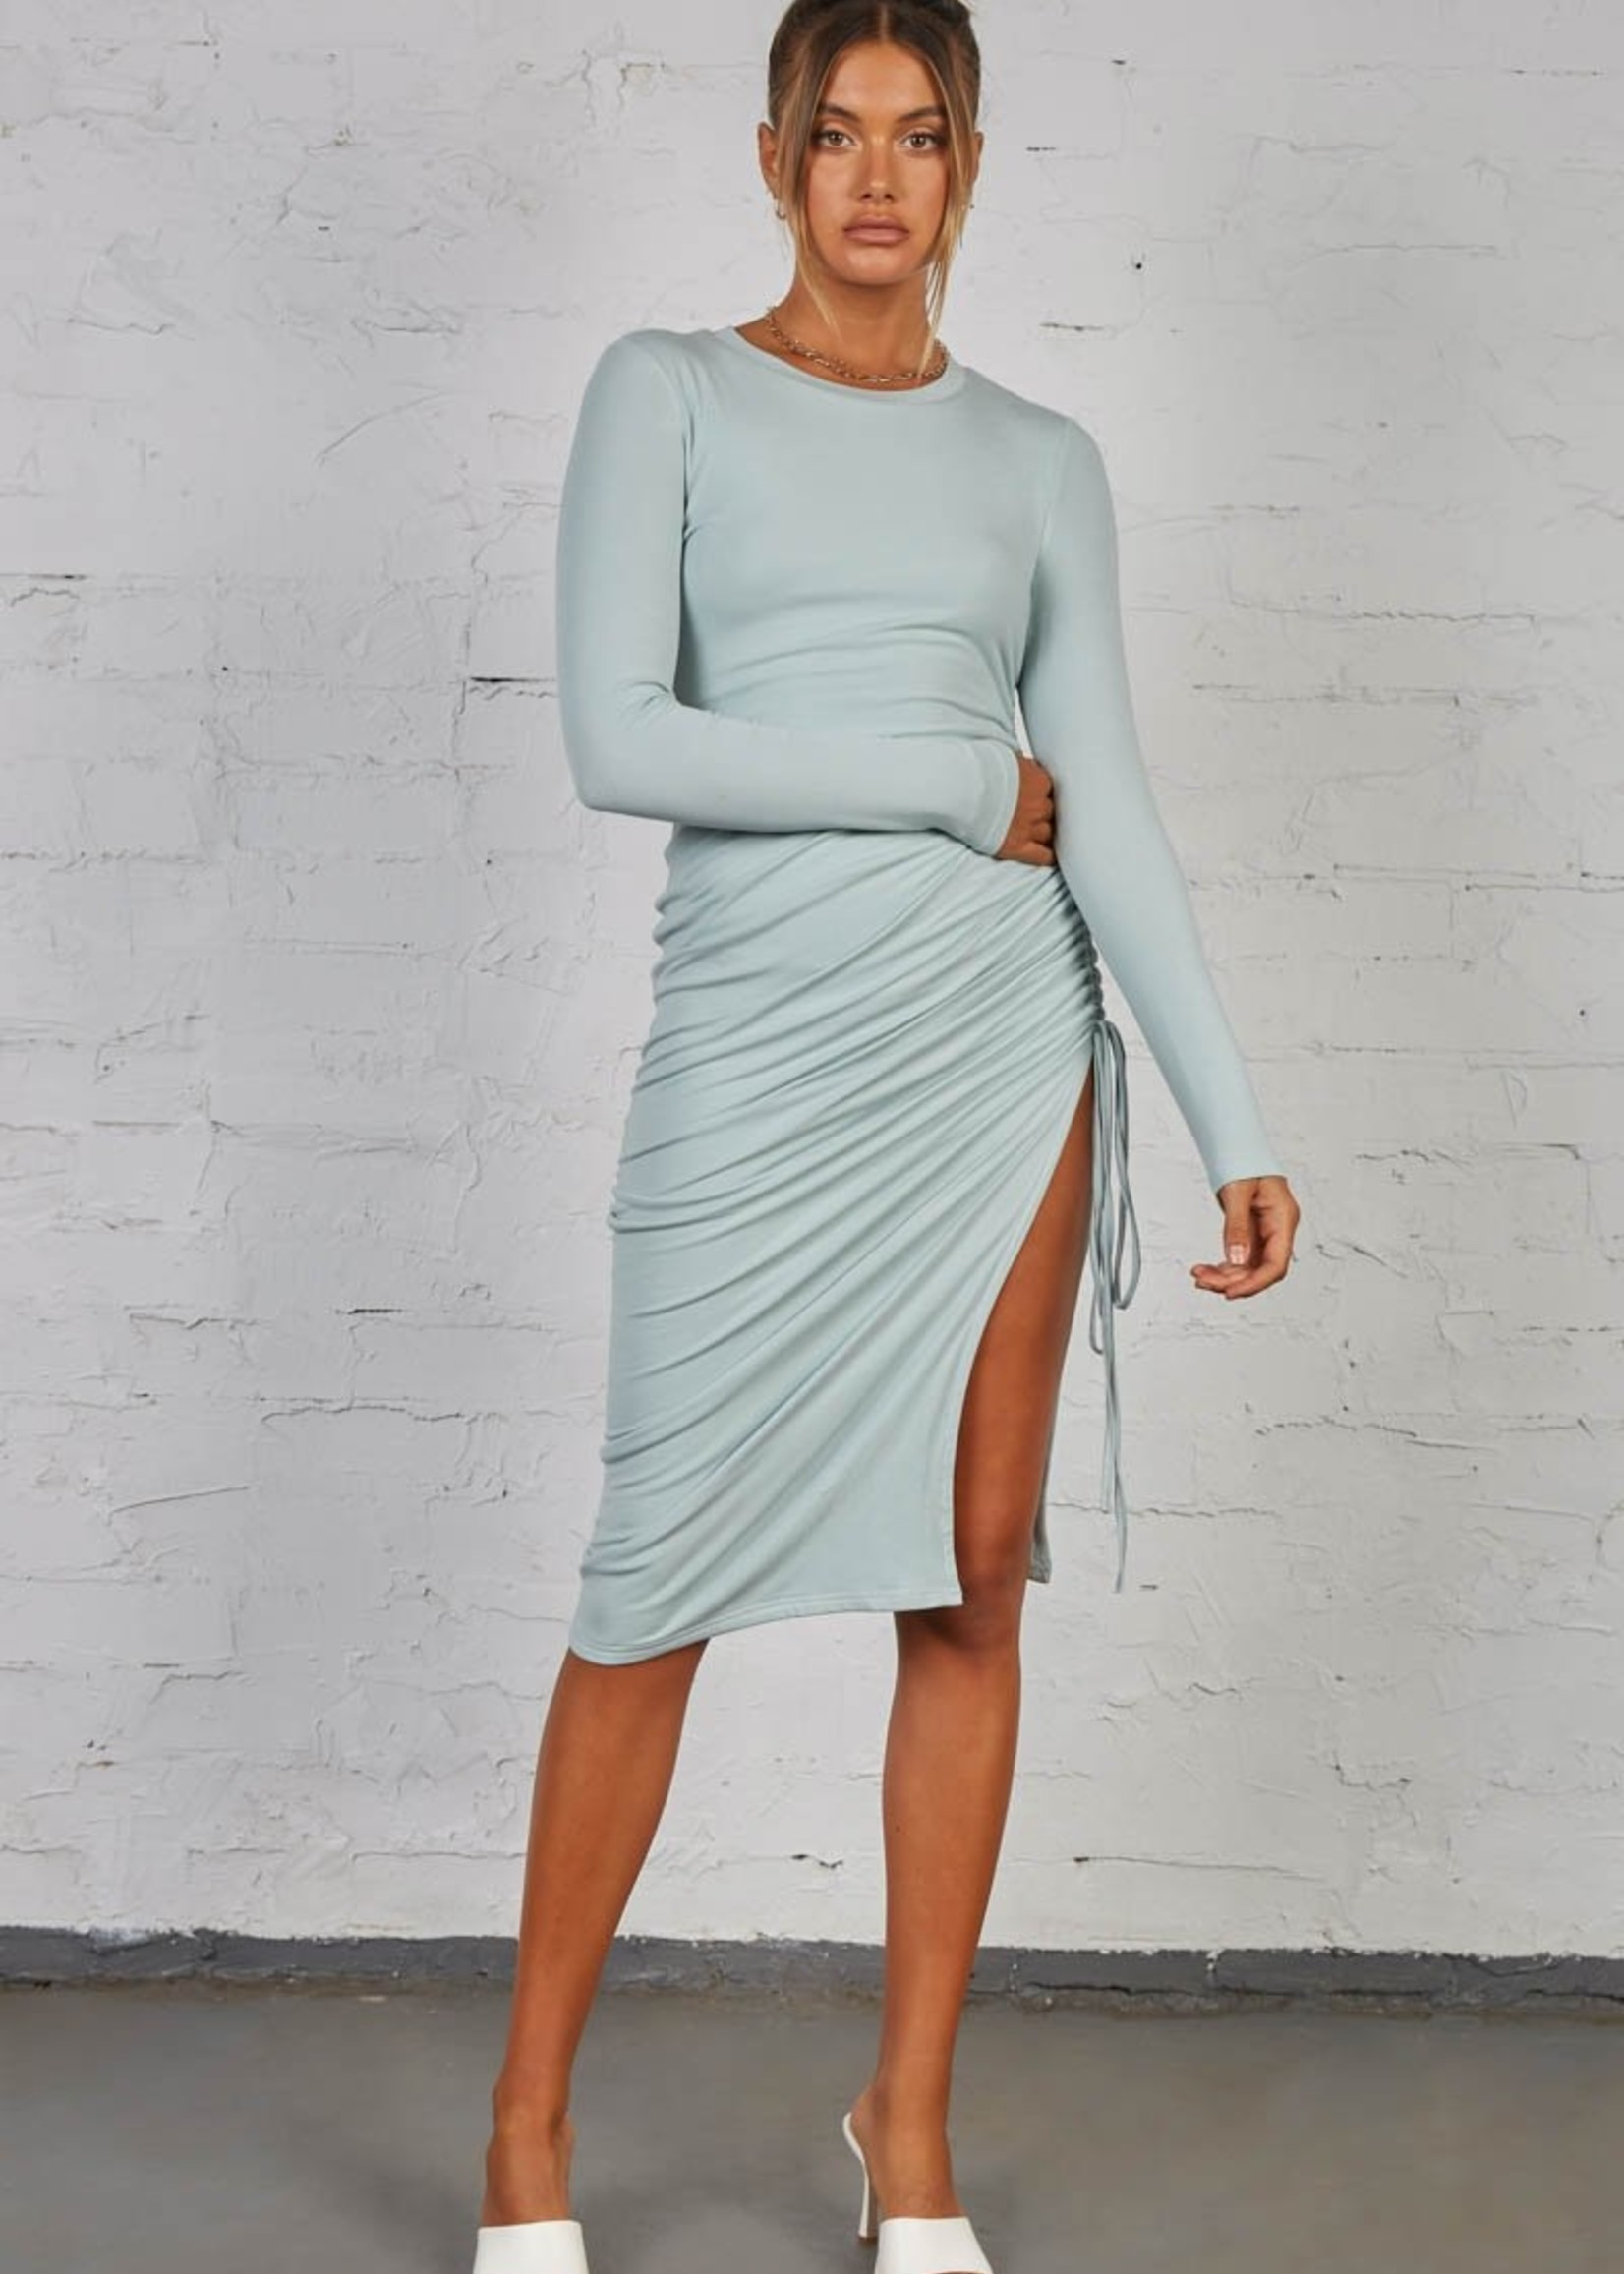 SNDYS Winter Dress